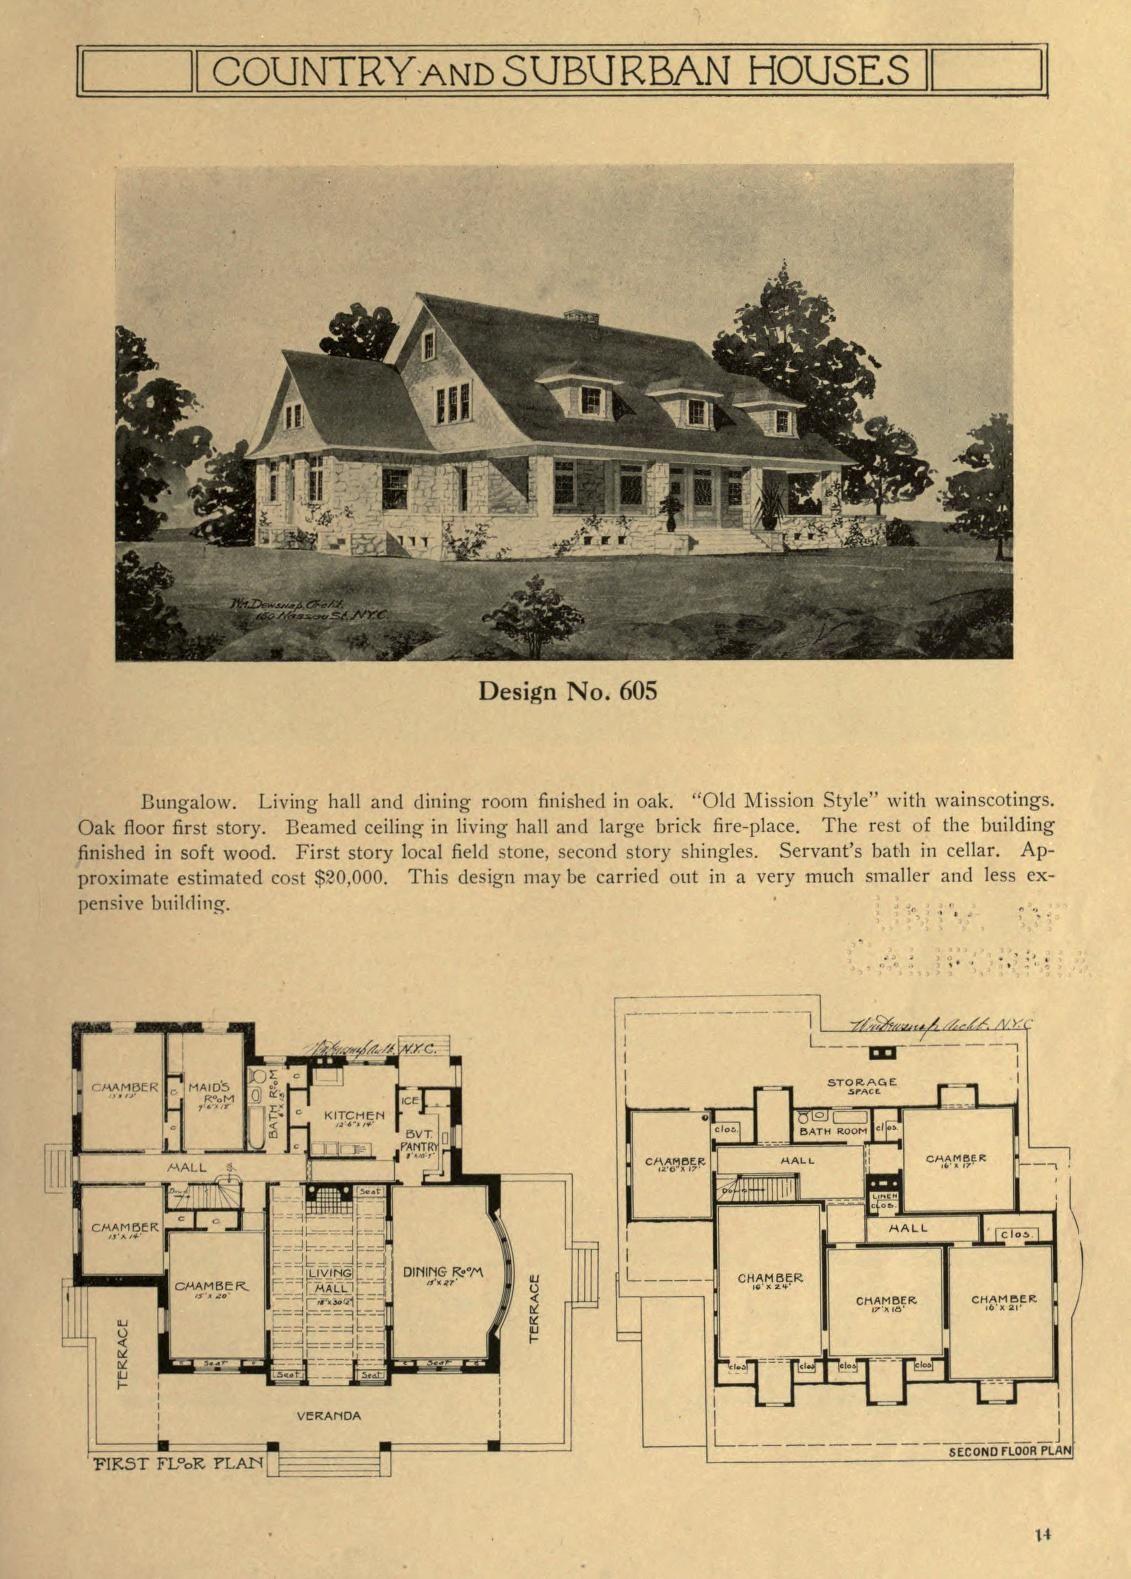 Pin By Henrietta Osborn On House Plans Floor Plans Vintage House Plans House Plans